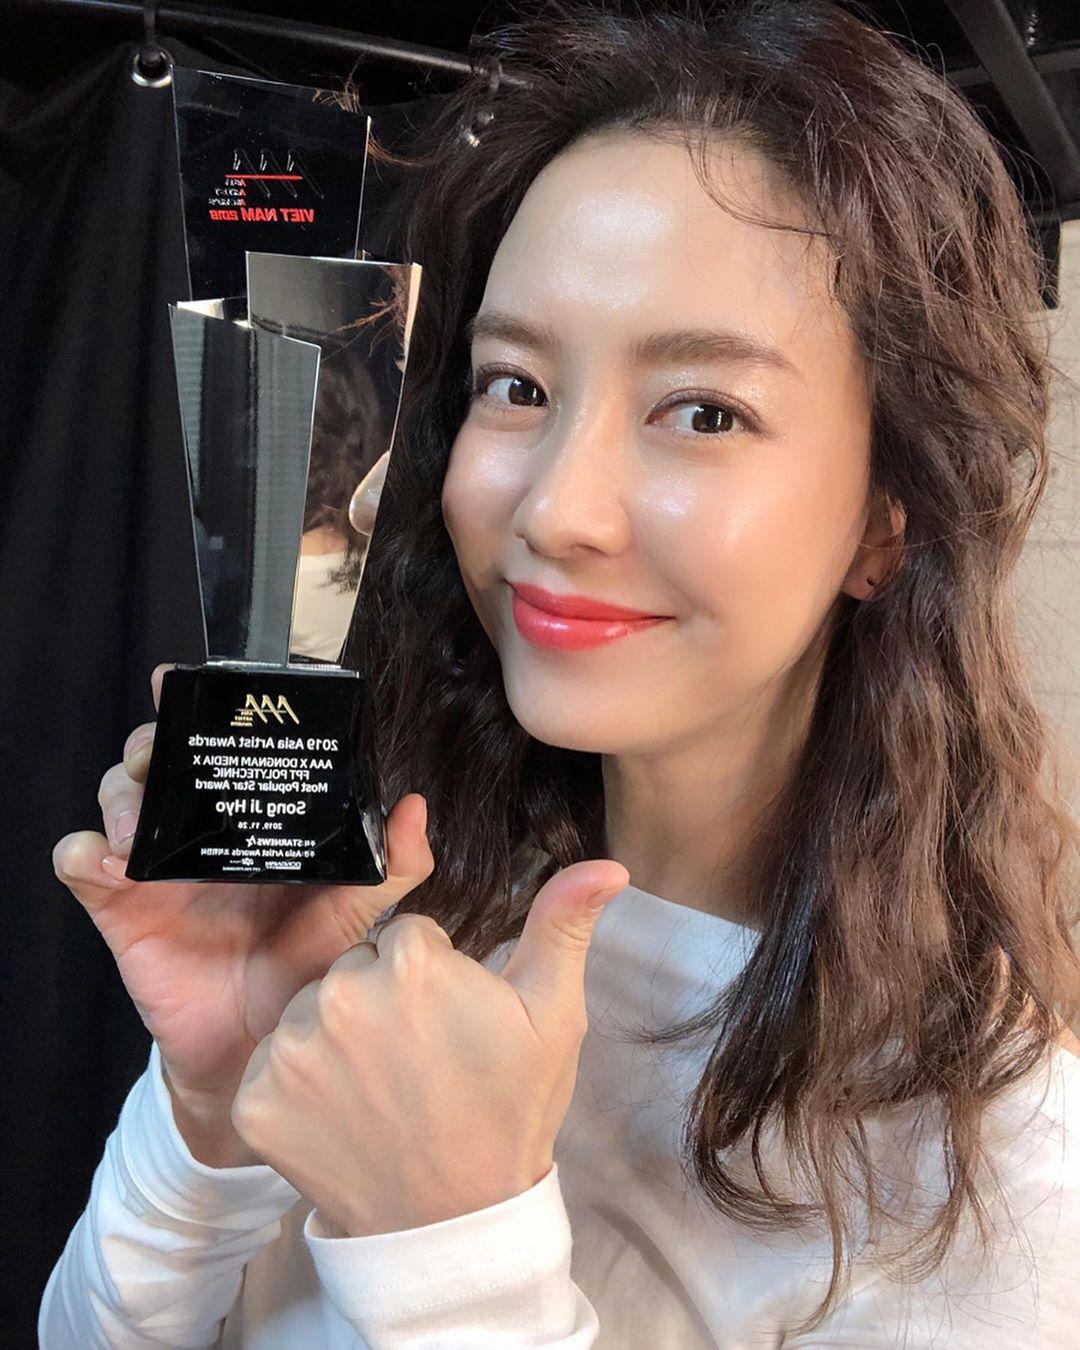 Song Ji-hyo South Korean Actress, Model